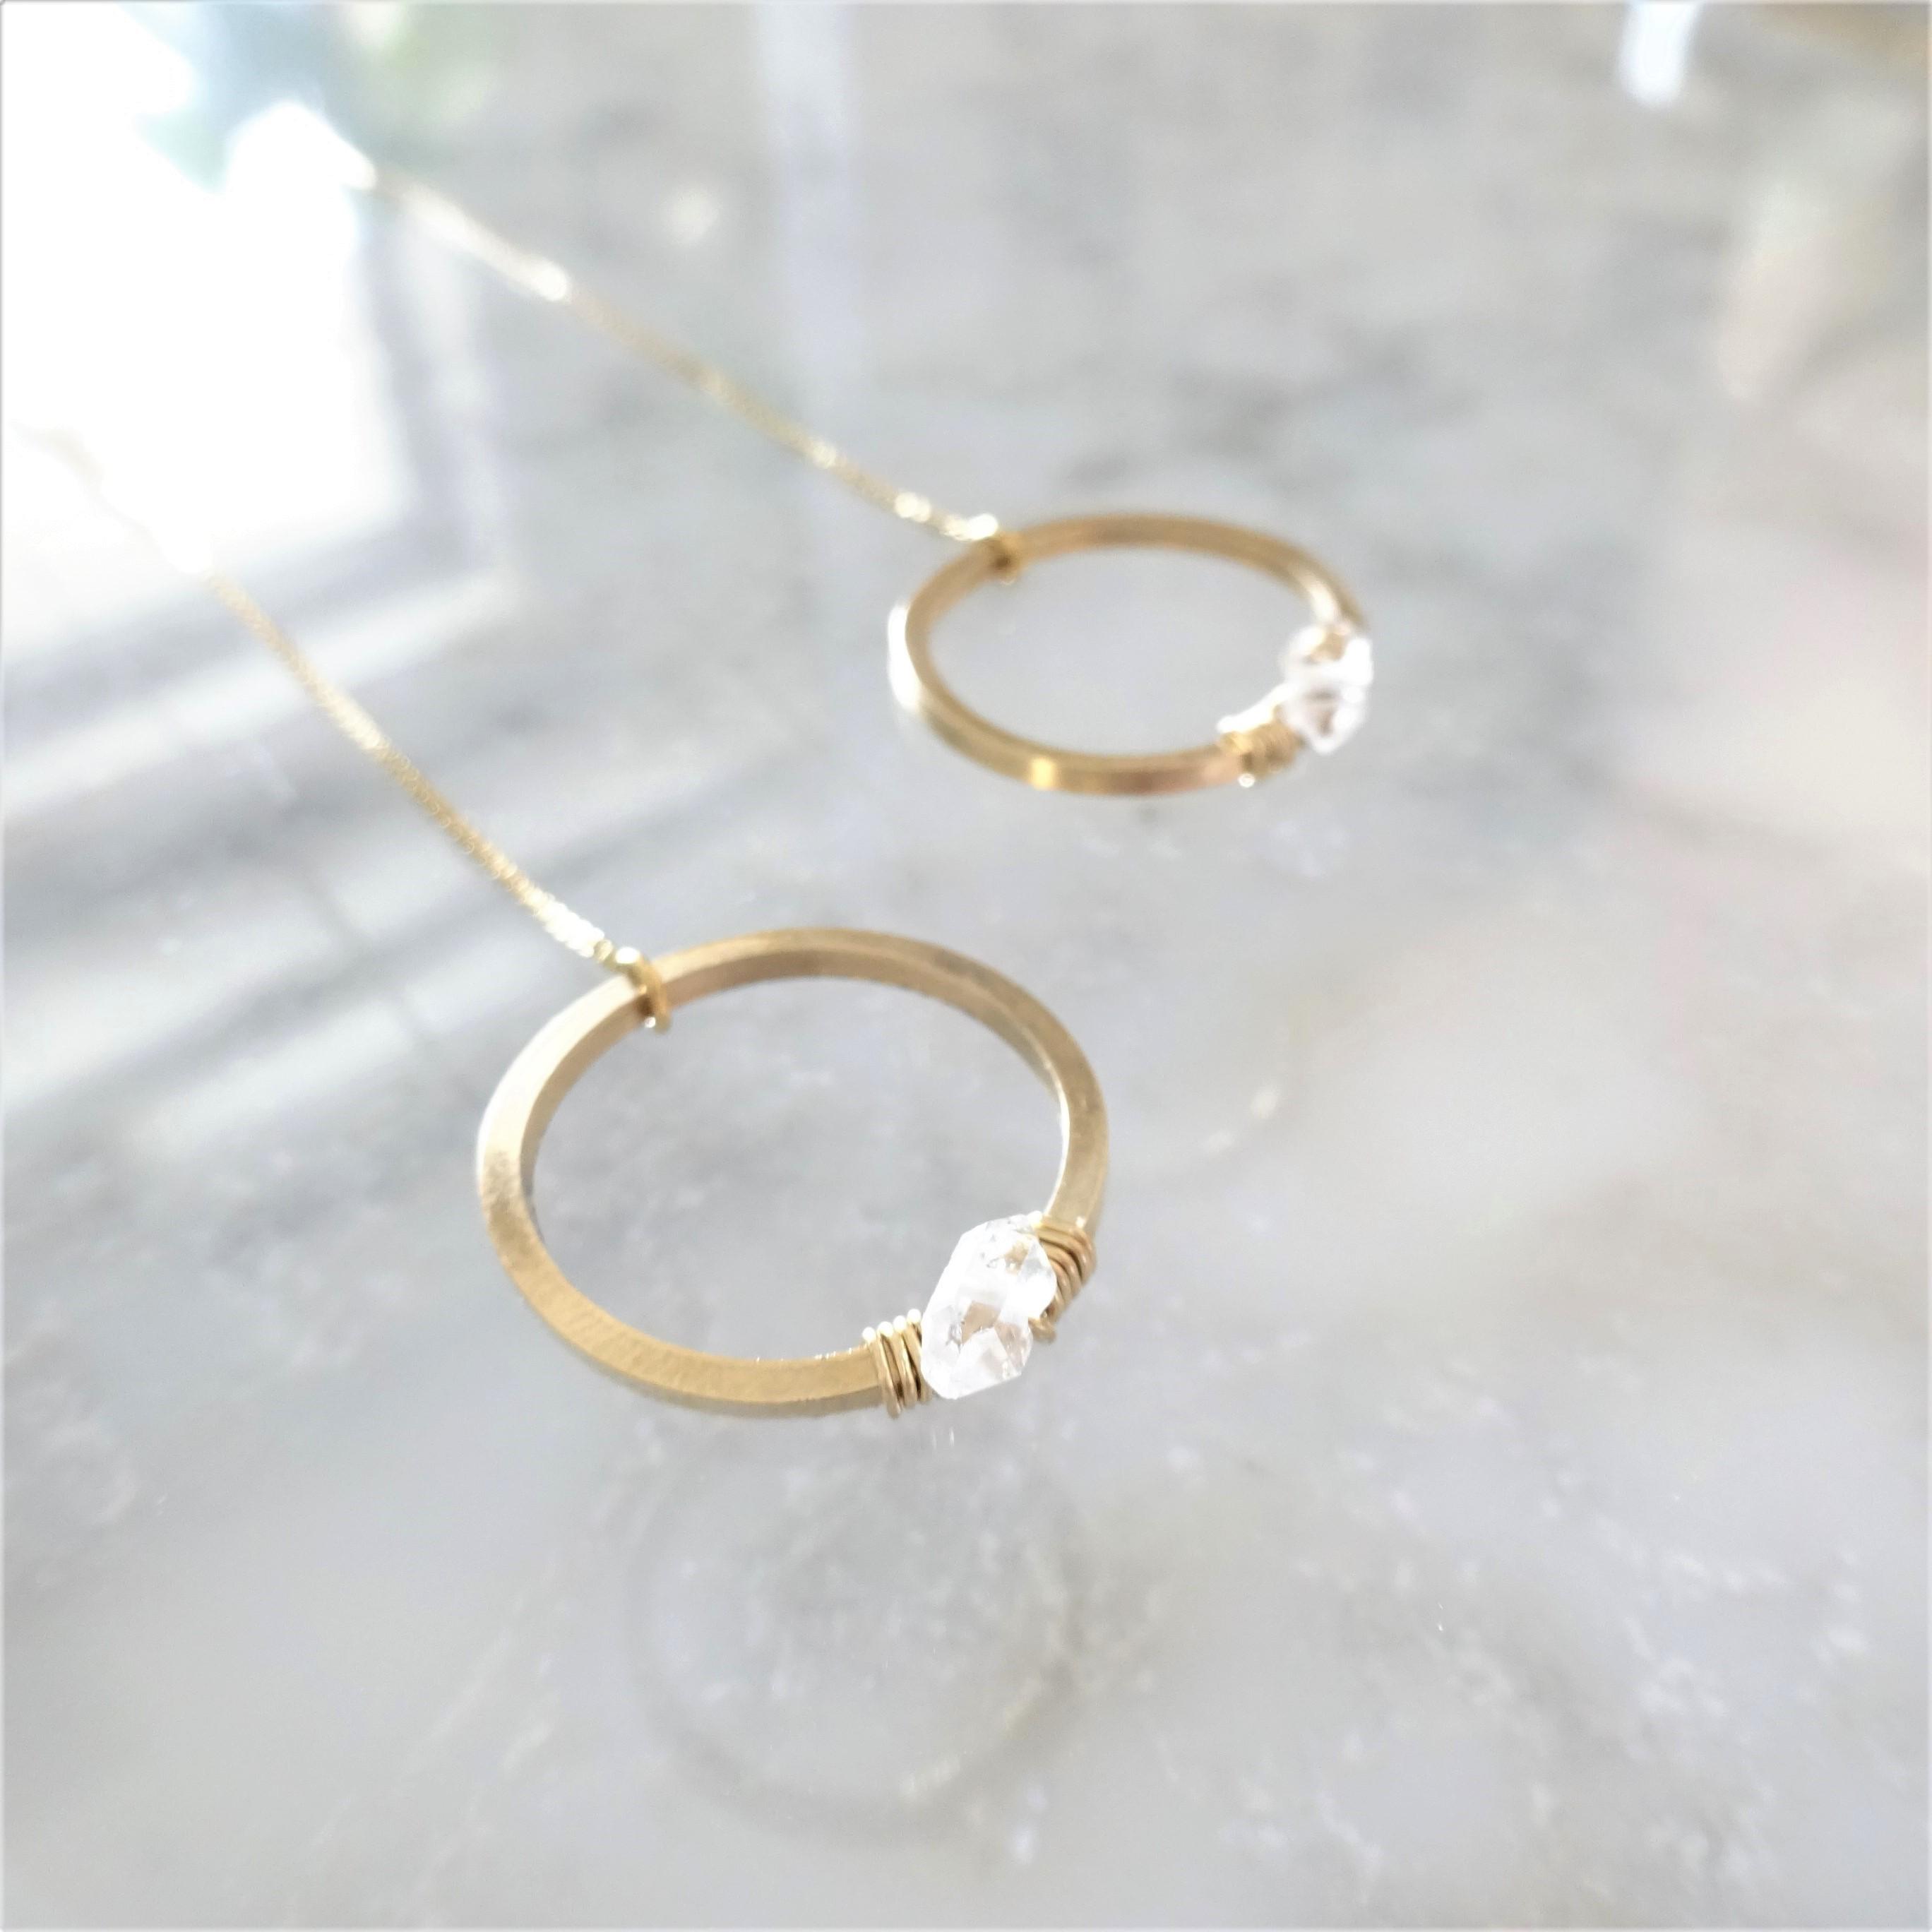 14kgf*Herkimerdiamond CIRCLE American pierced earring